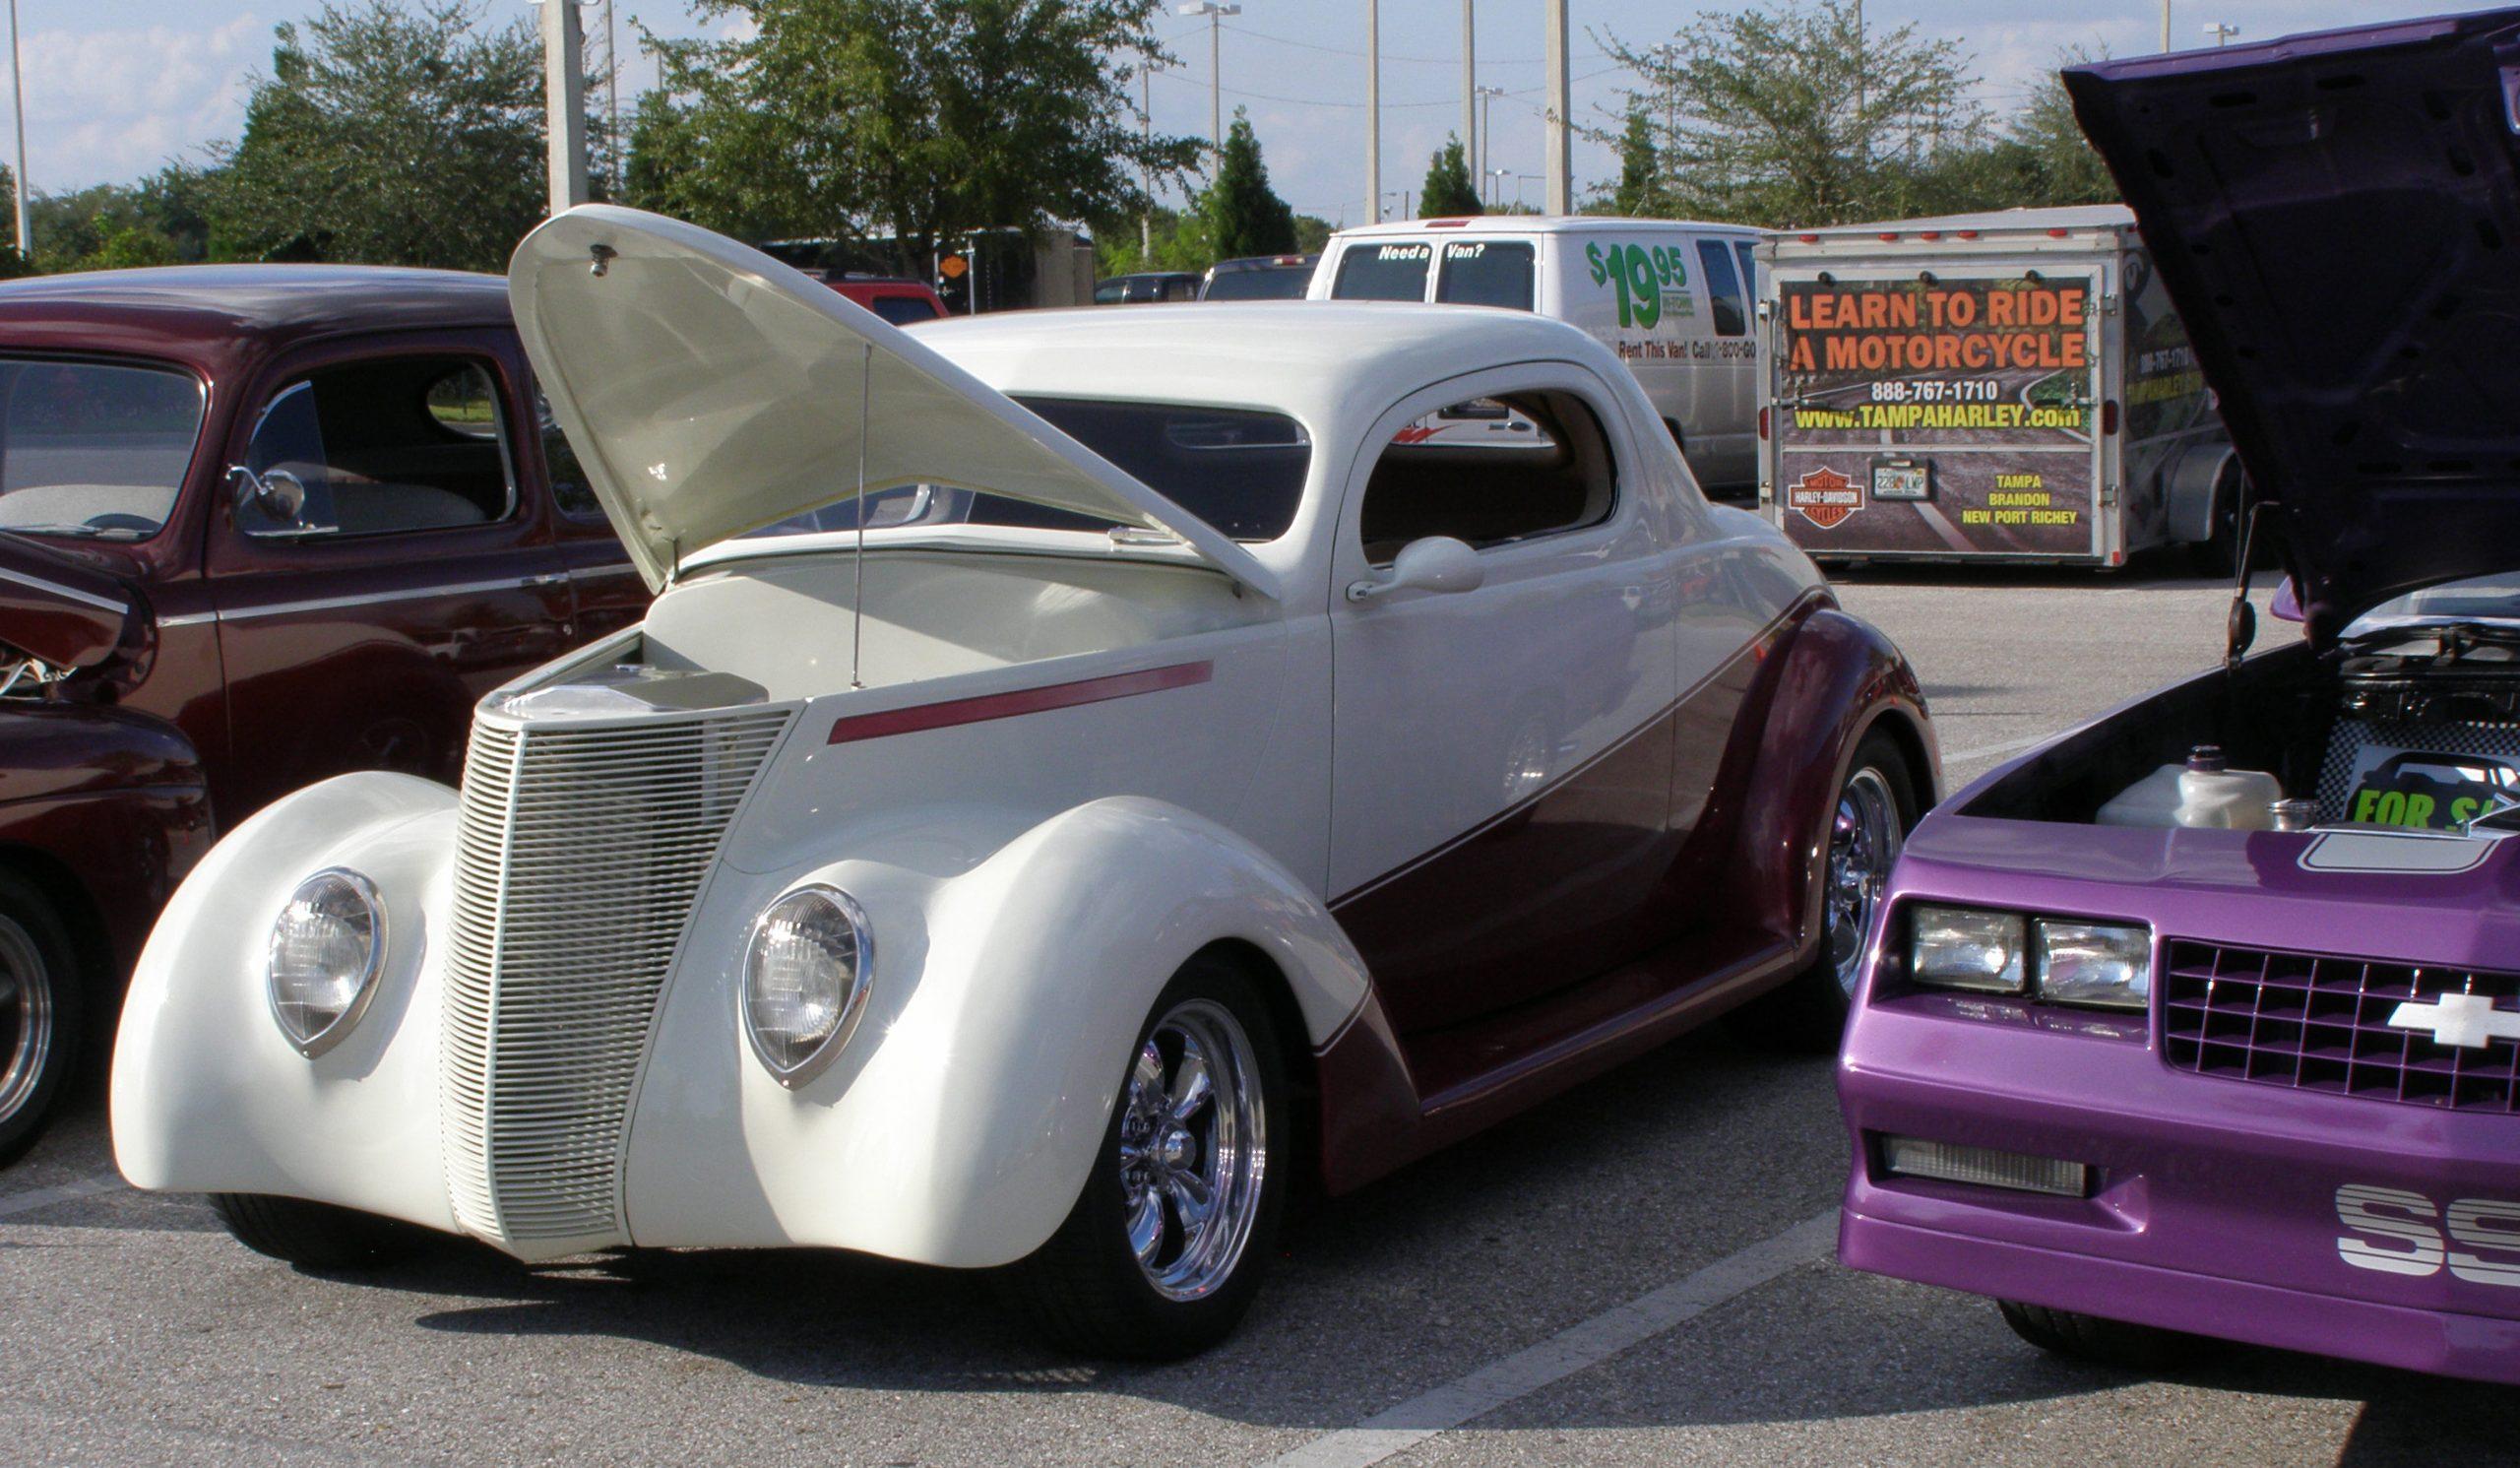 BEEF 'O' BRADY'S BENEFIT CAR & TRUCK SHOW